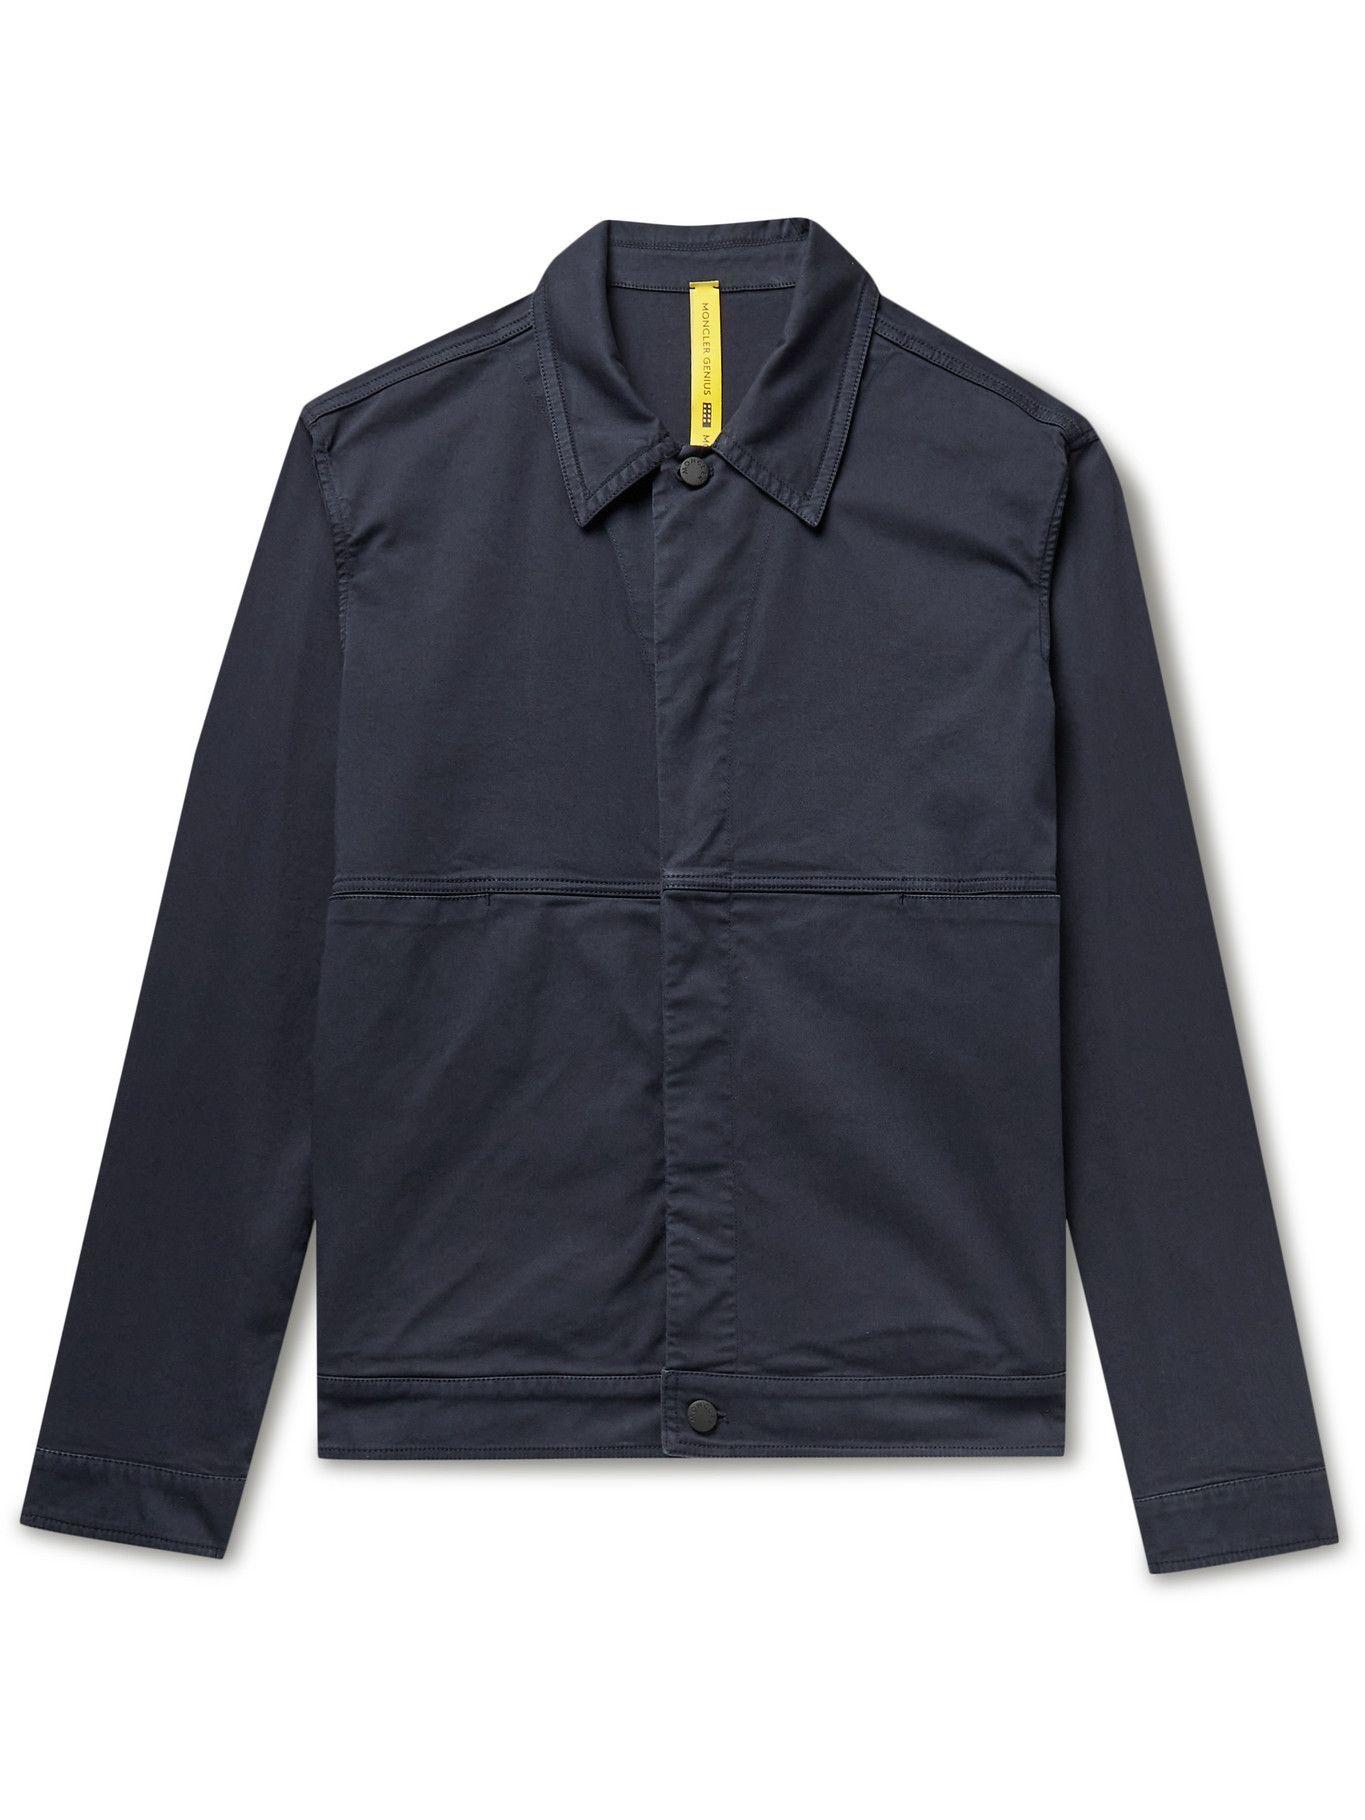 Photo: MONCLER GENIUS - 5 Moncler Craig Green Coleonyx Cotton-Blend Twill Jacket - Blue